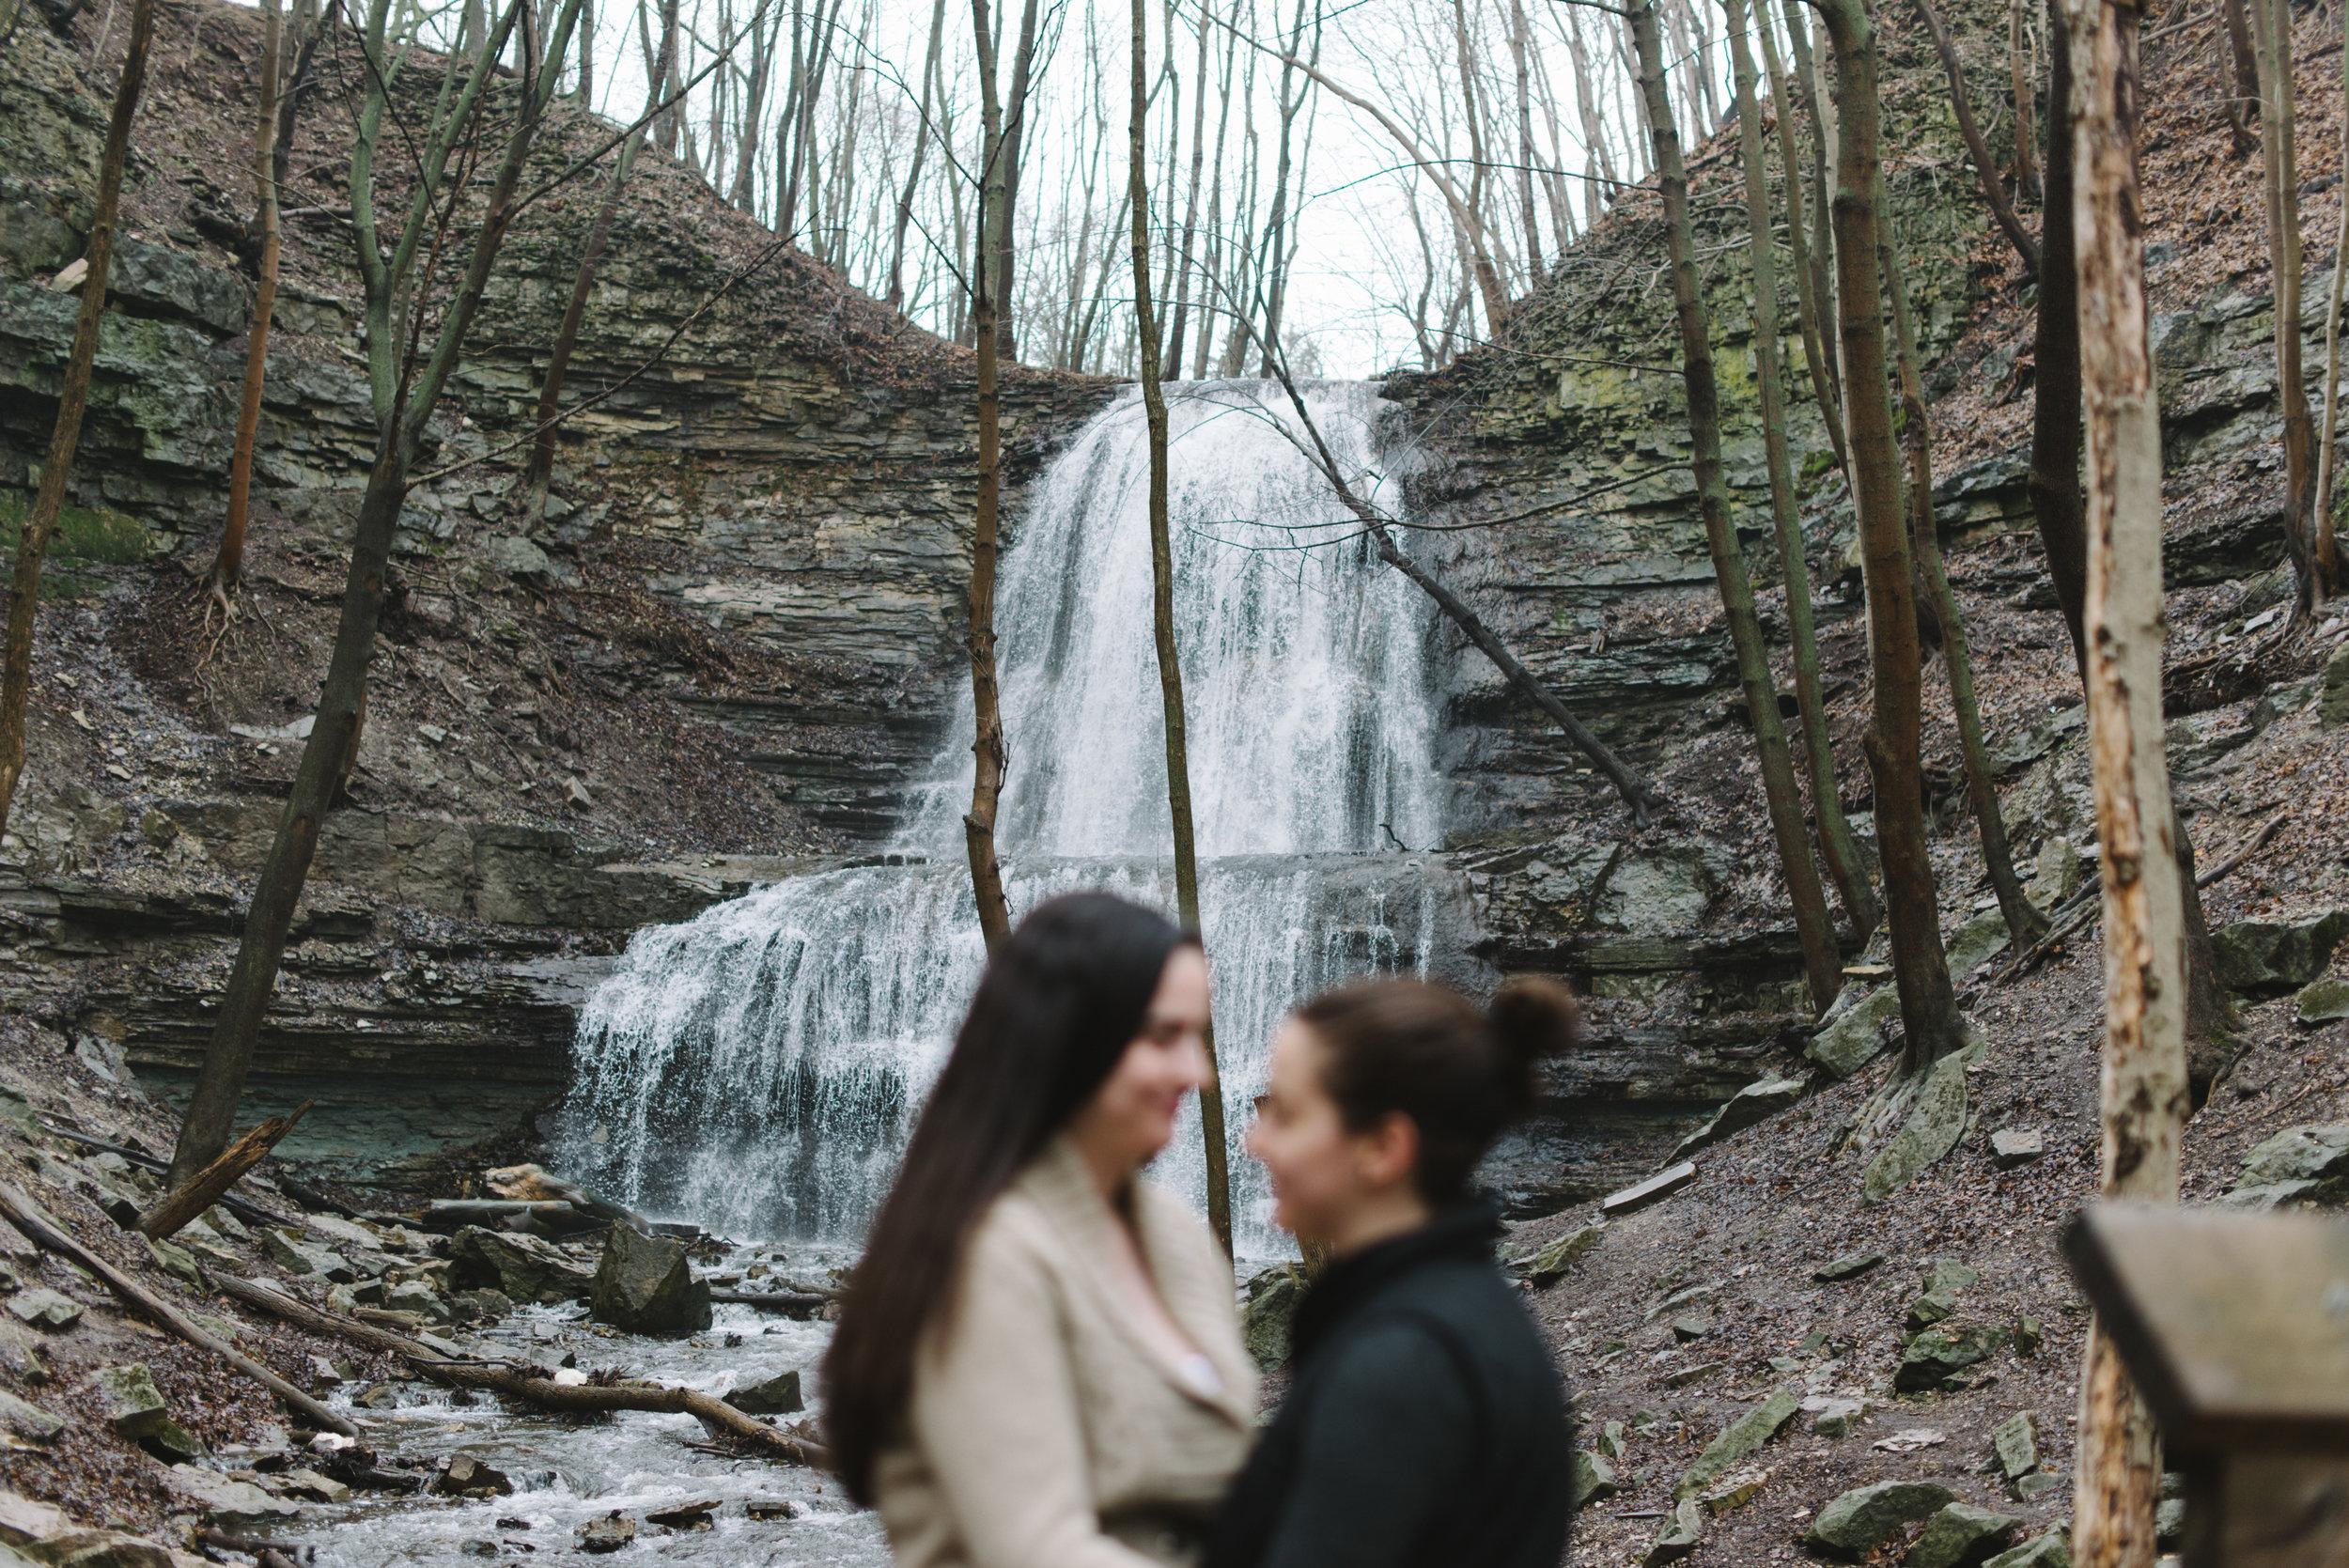 RosewoodWeddingPhotos-TeresaDeanna-EngagementSession-Hamilton-ShermanFalls-Ancaster-Hike-SameSexCouple-LGBTQ-TorontoWeddingPhotographer-Waterfall